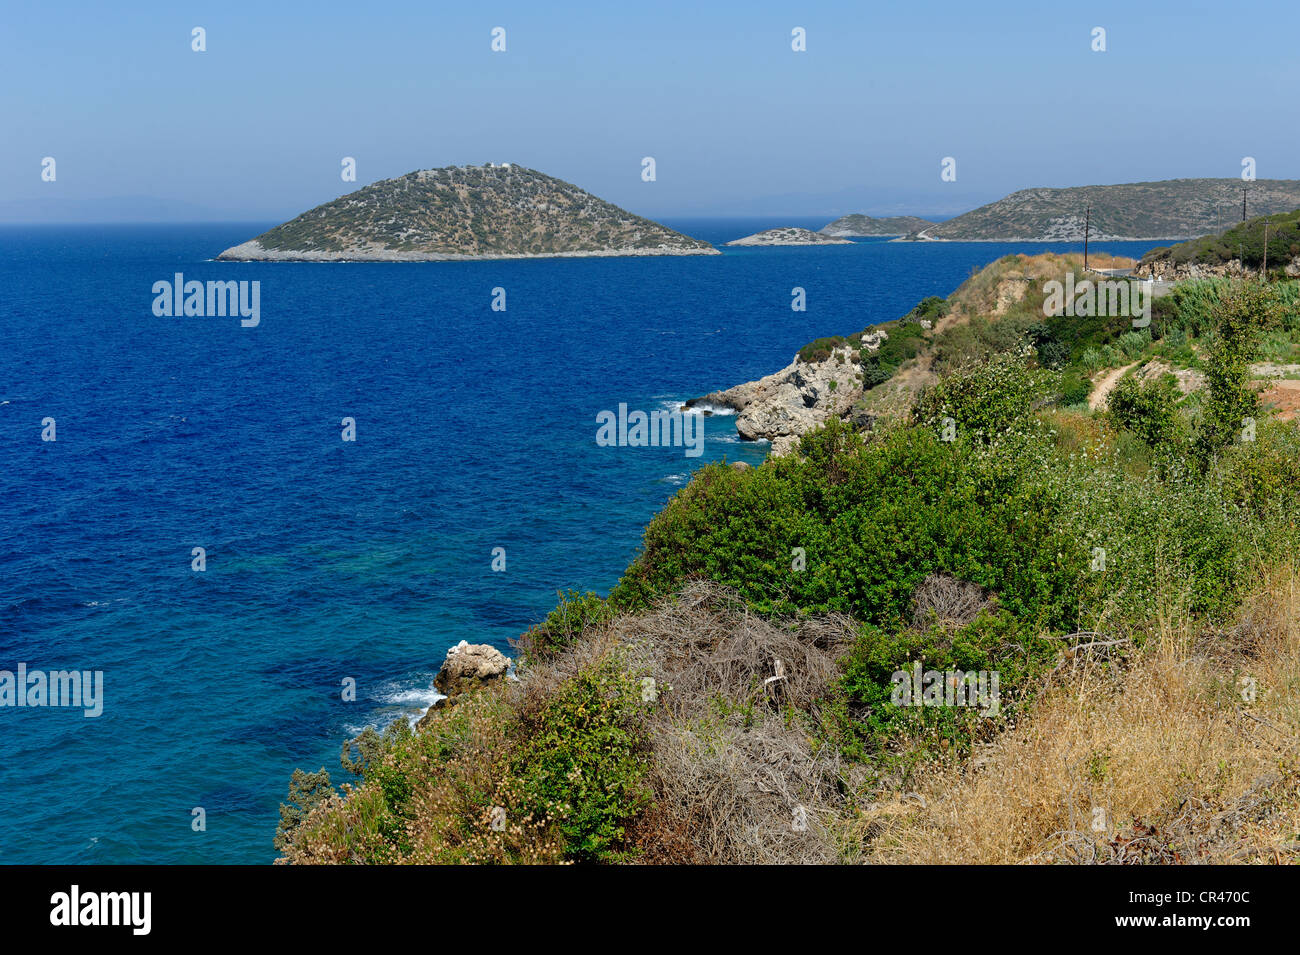 Nisida Atios Nikolaos island, bay of Asprochorti, Samos island, southern Sporades, Aegean sea, Greece, Europe - Stock Image